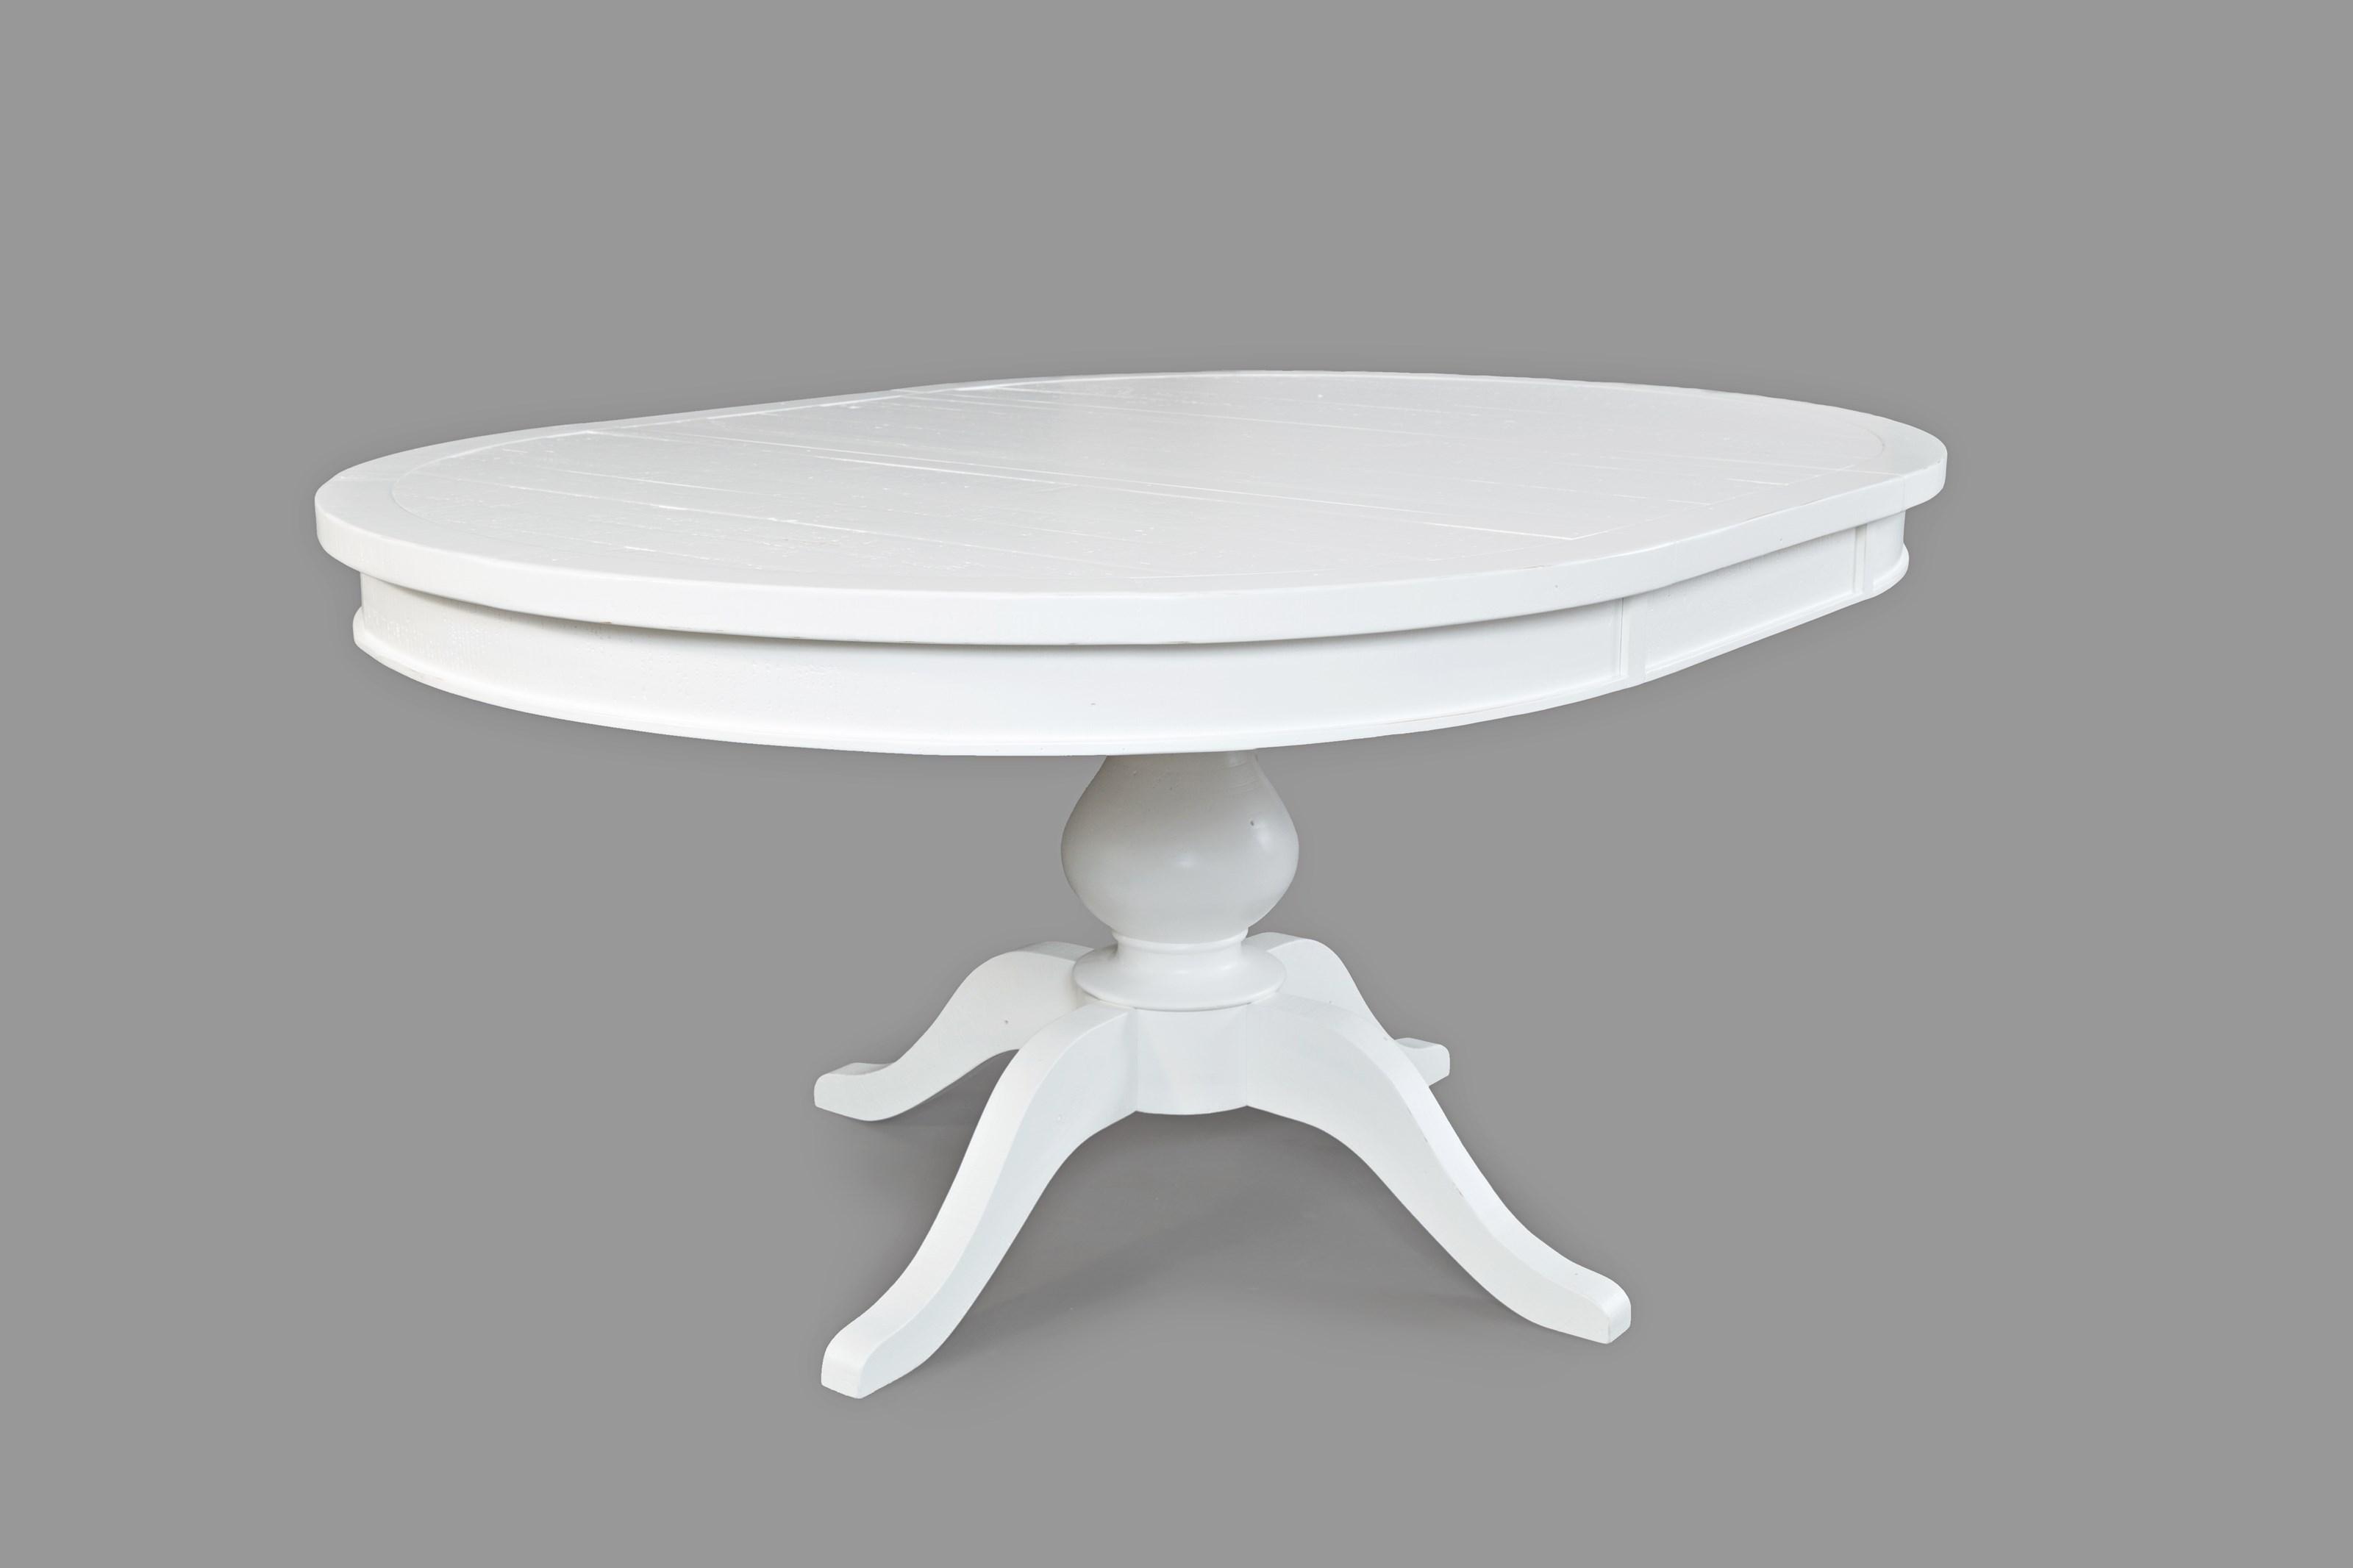 Jofran Madaket Round to Oval - Pedestal Dining Table   H.L ...